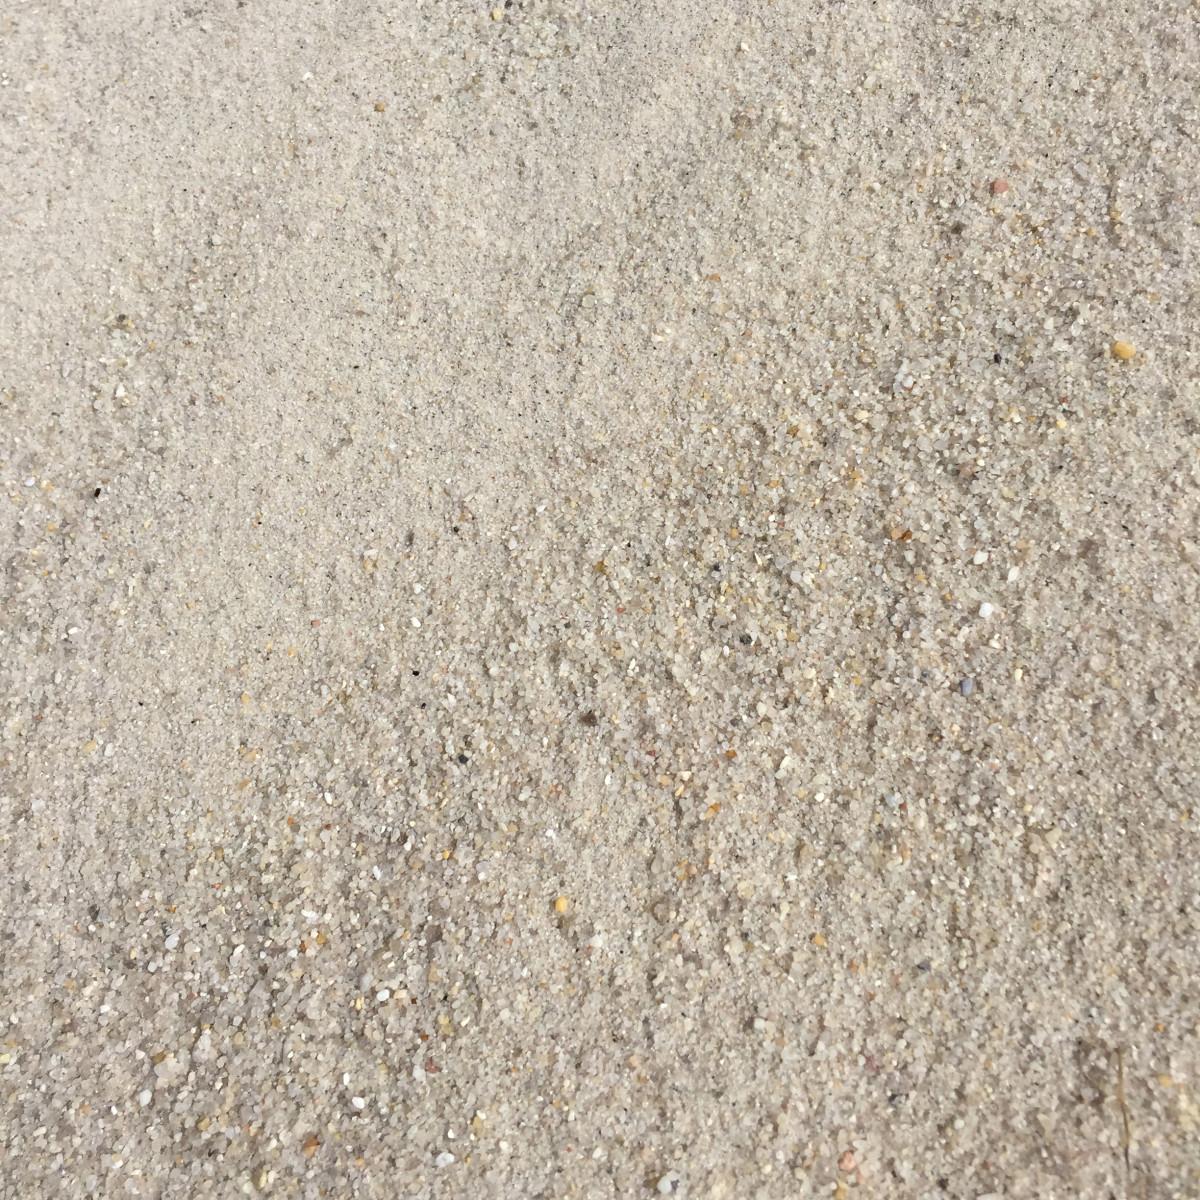 sand supplier bucks county pa